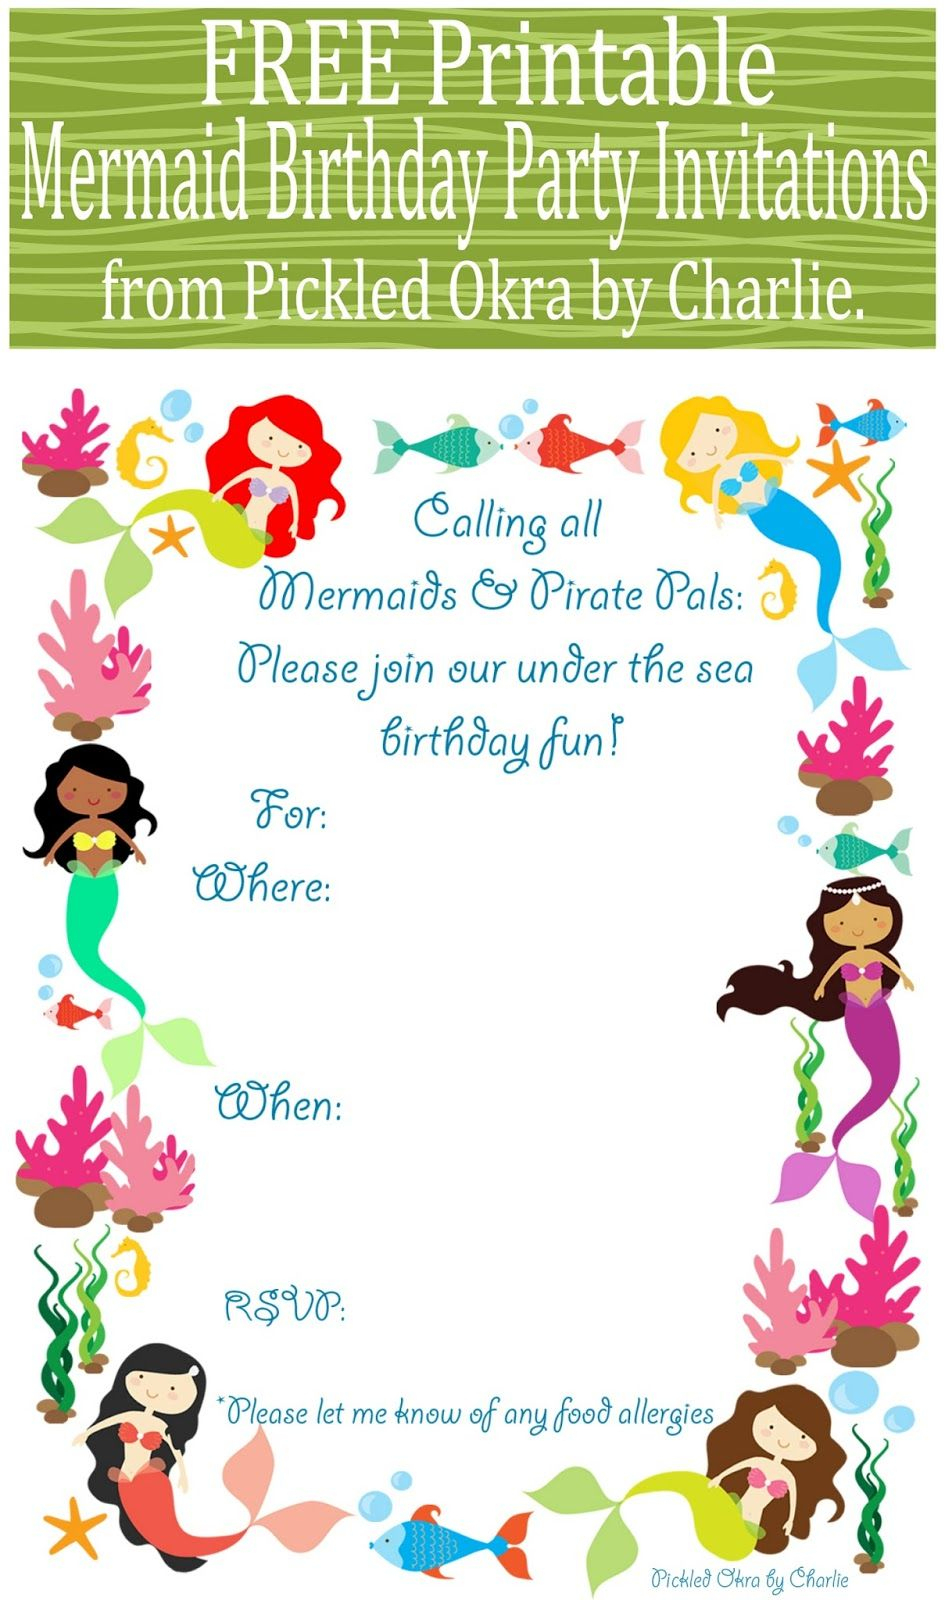 Free Printable Mermaid Birthday Party Invitations For Your Next - Free Printable Mermaid Thank You Cards